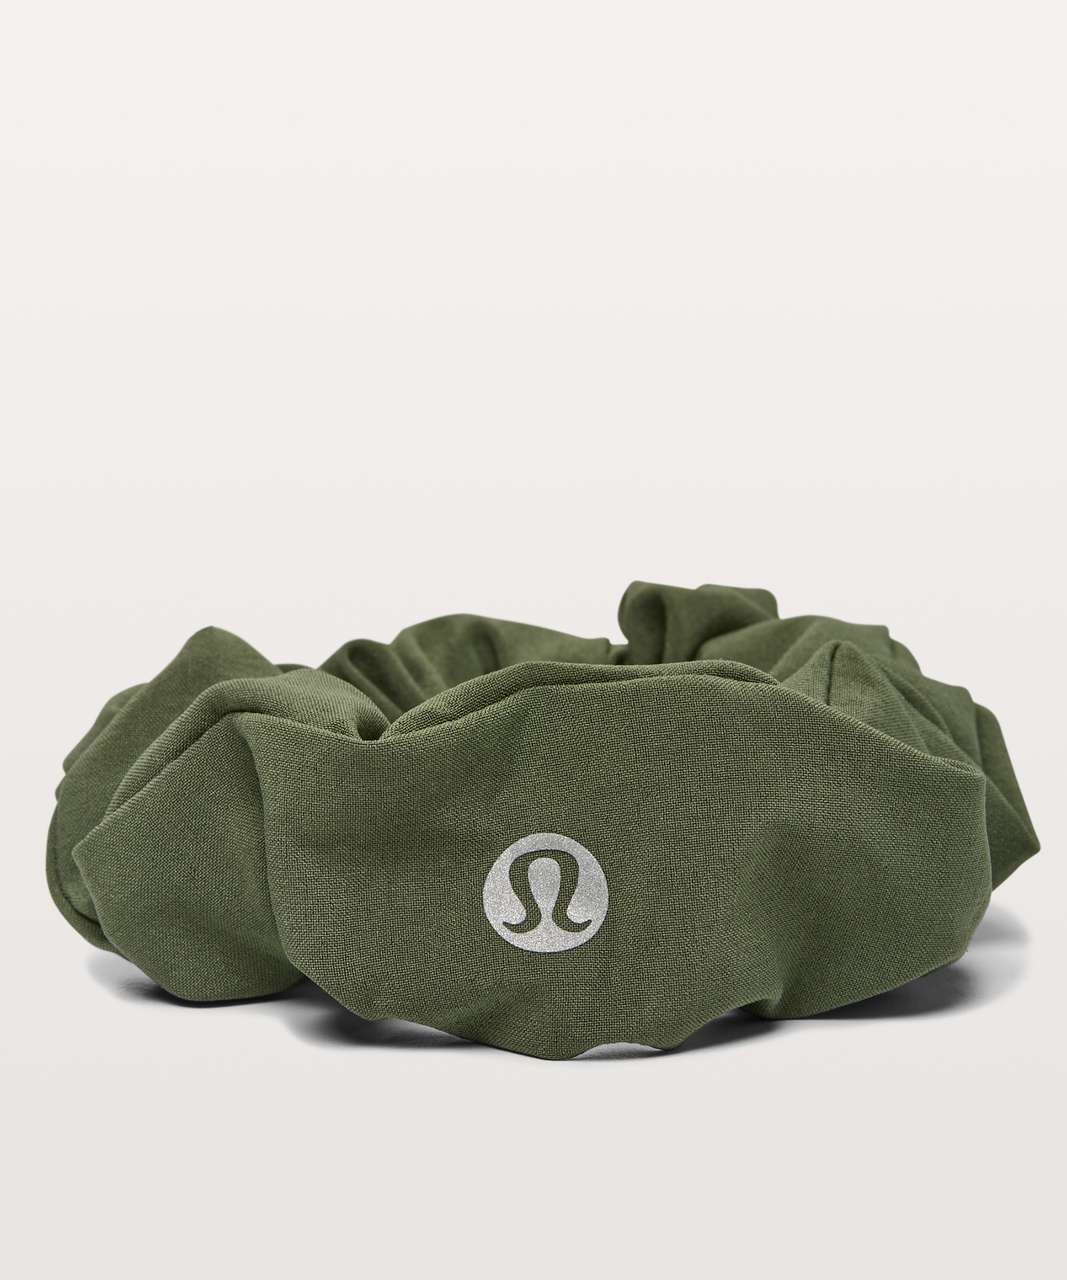 Lululemon Uplifting Scrunchie - Barracks Green